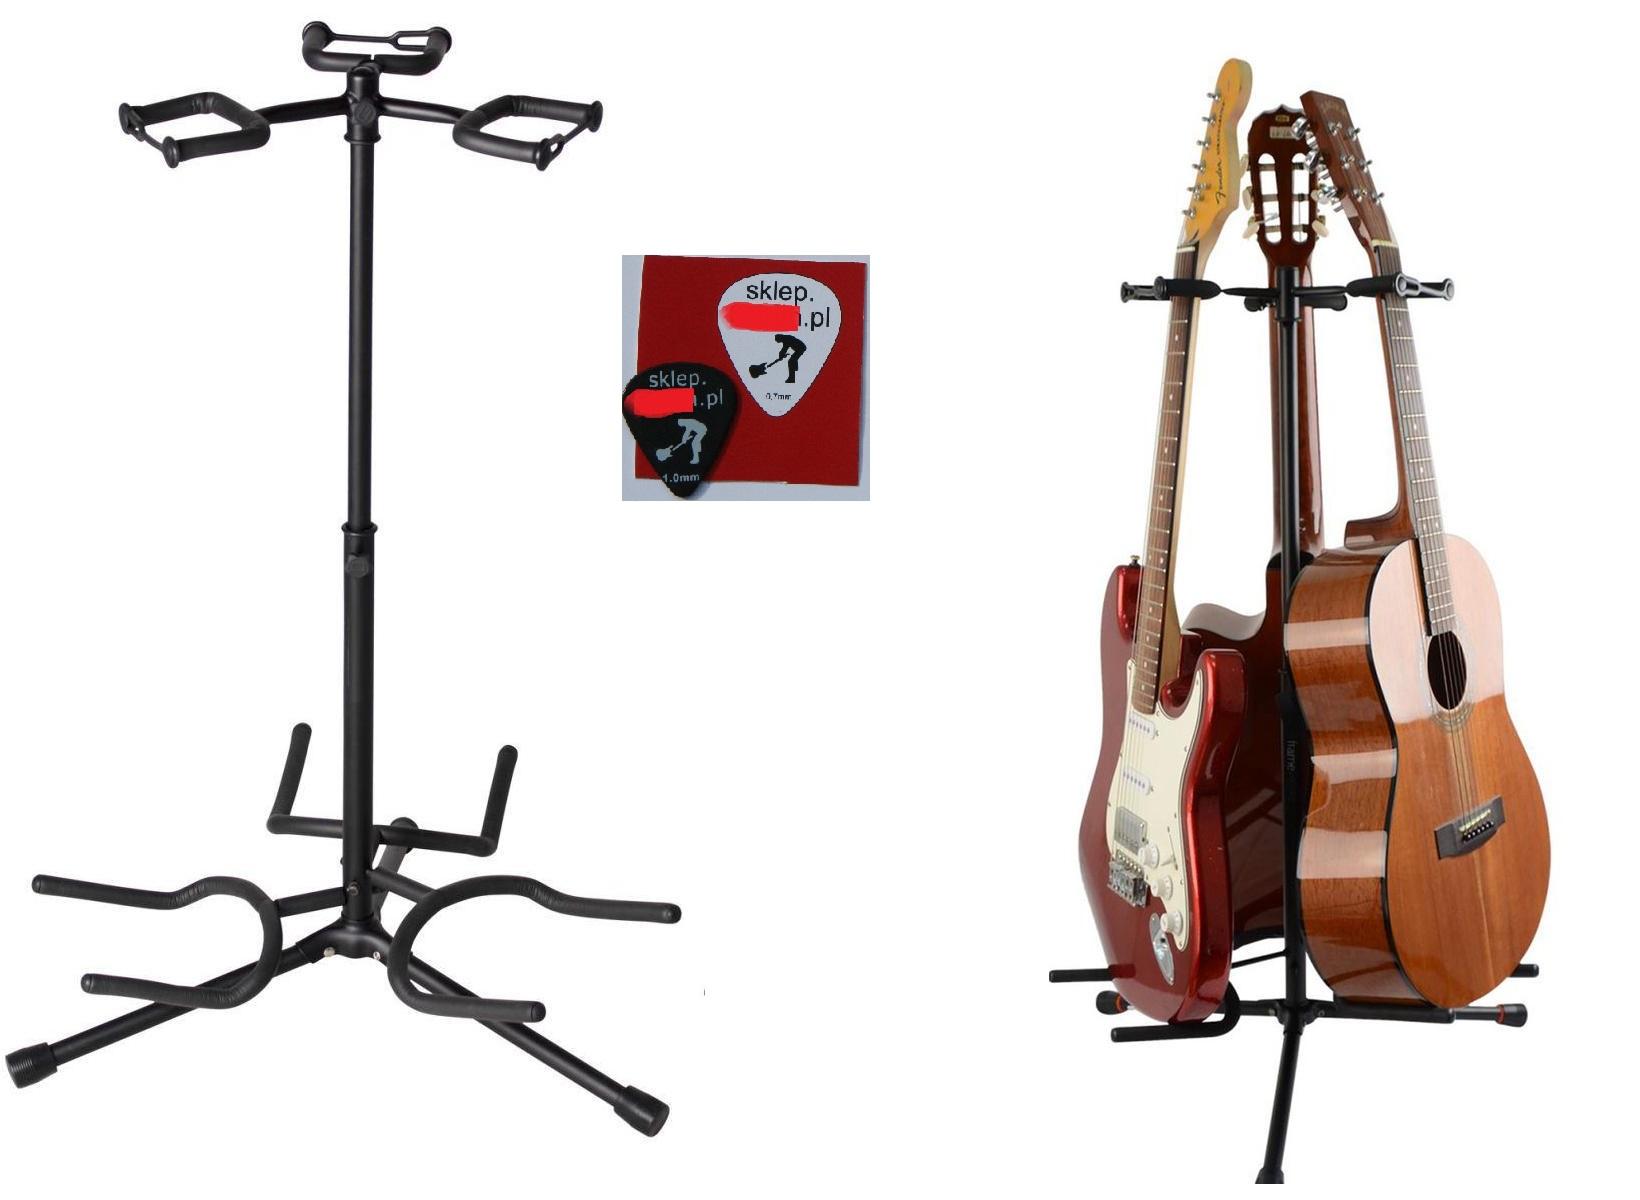 STAND TRIPOOD GUITAR 3 Gitary Carousel + Cube